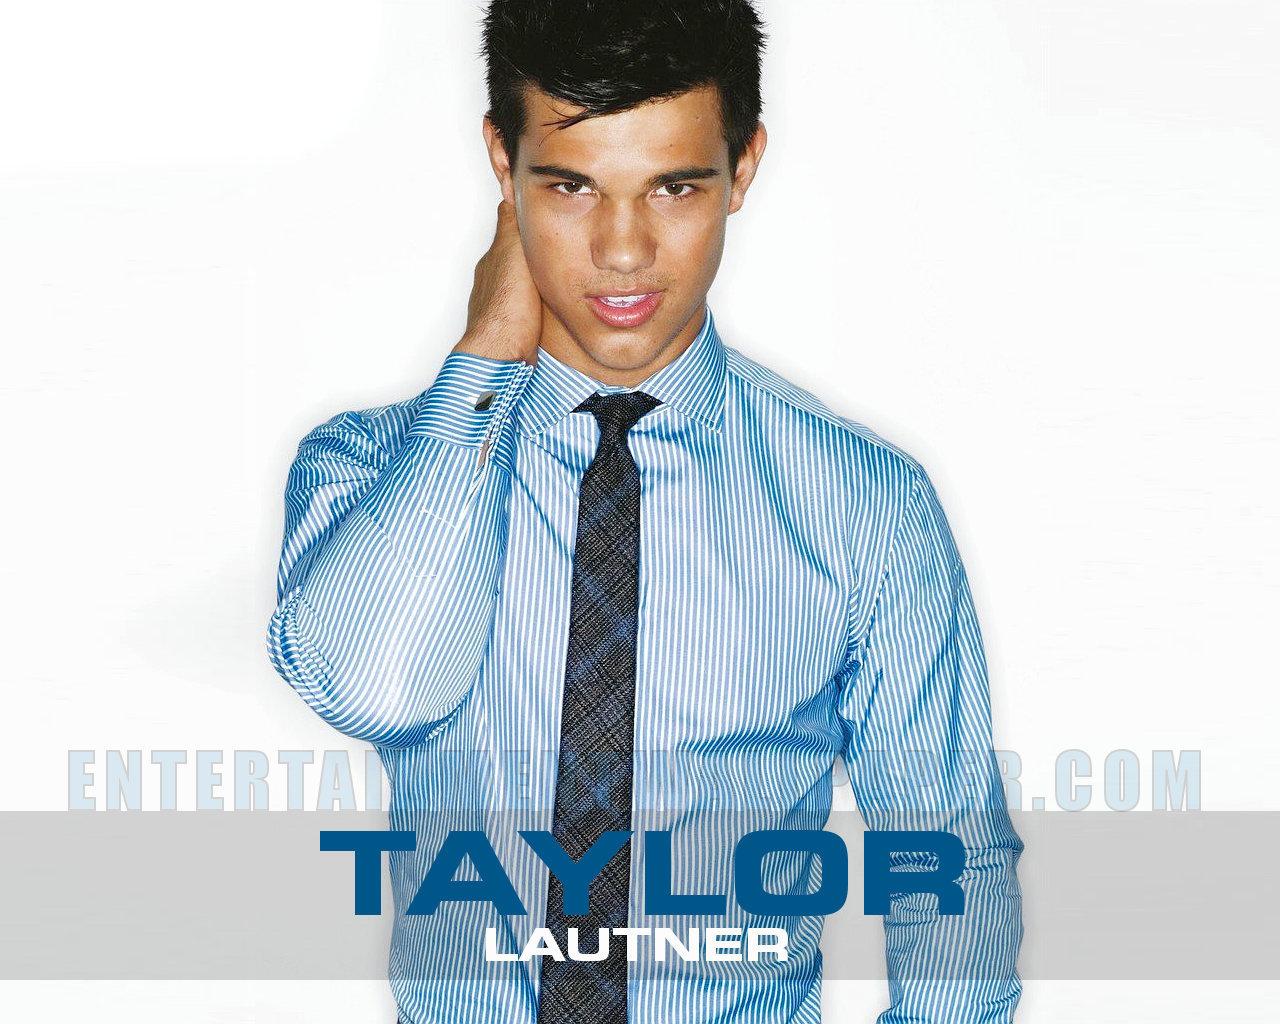 http://4.bp.blogspot.com/_v86pN0tym4k/TM6zI3T7EfI/AAAAAAAAETA/Vcqz2trdmxs/s1600/Taylor-Lautner-taylor-lautner-12054479-1280-1024.jpg